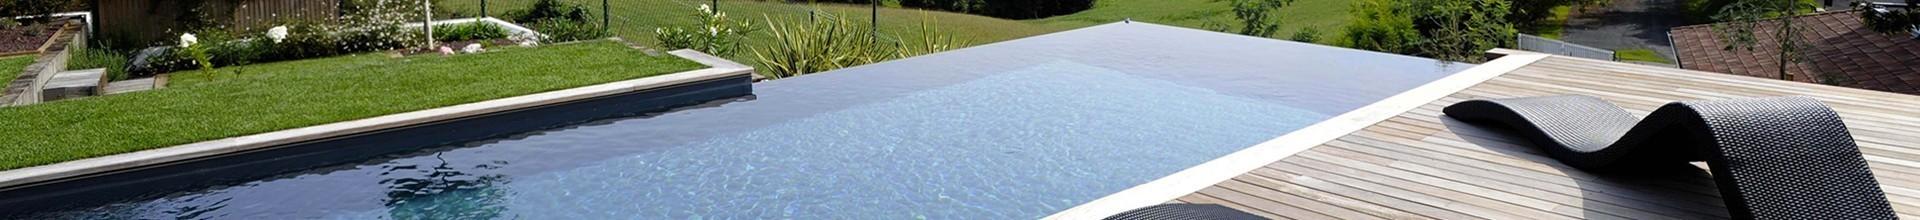 Direct usine, piscine coque prix Malines